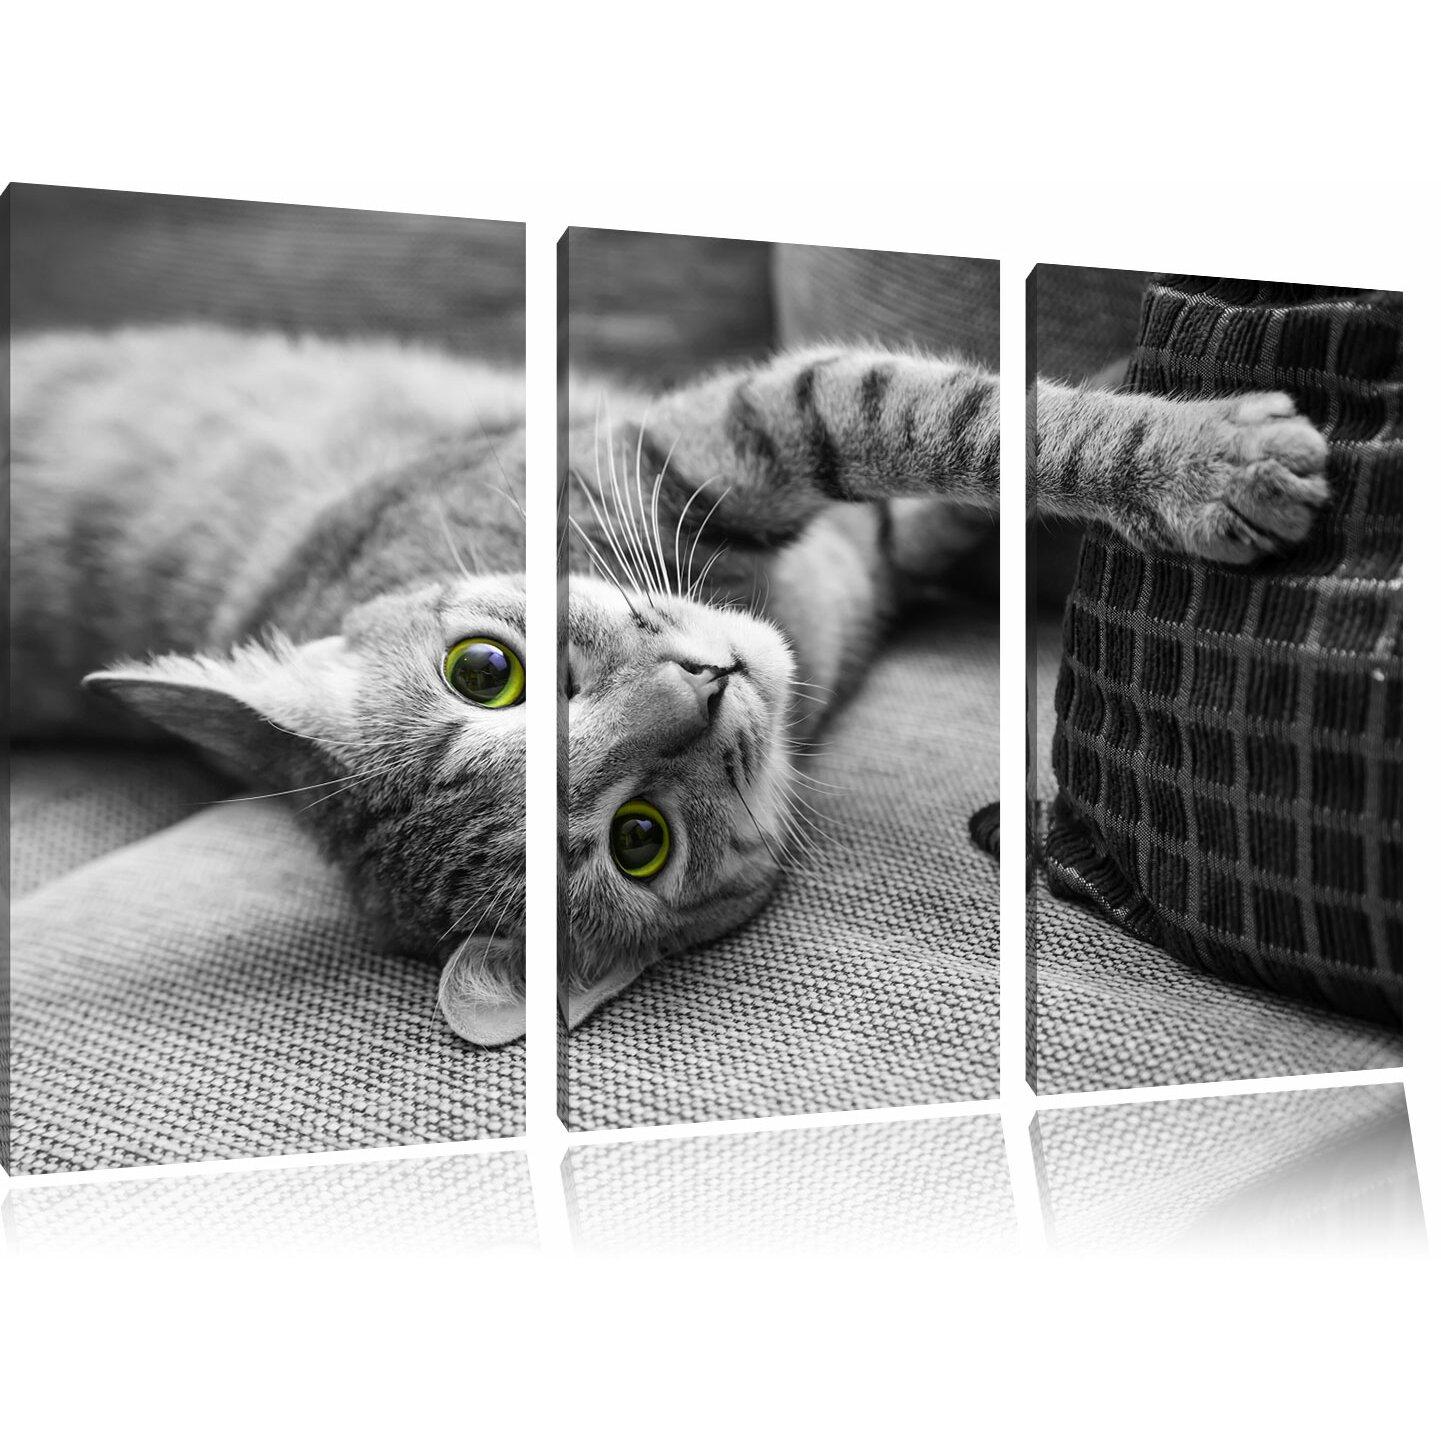 pixxprint 3 tlg leinwandbilder set niedliche katze spielt mit kissen fotodruck. Black Bedroom Furniture Sets. Home Design Ideas